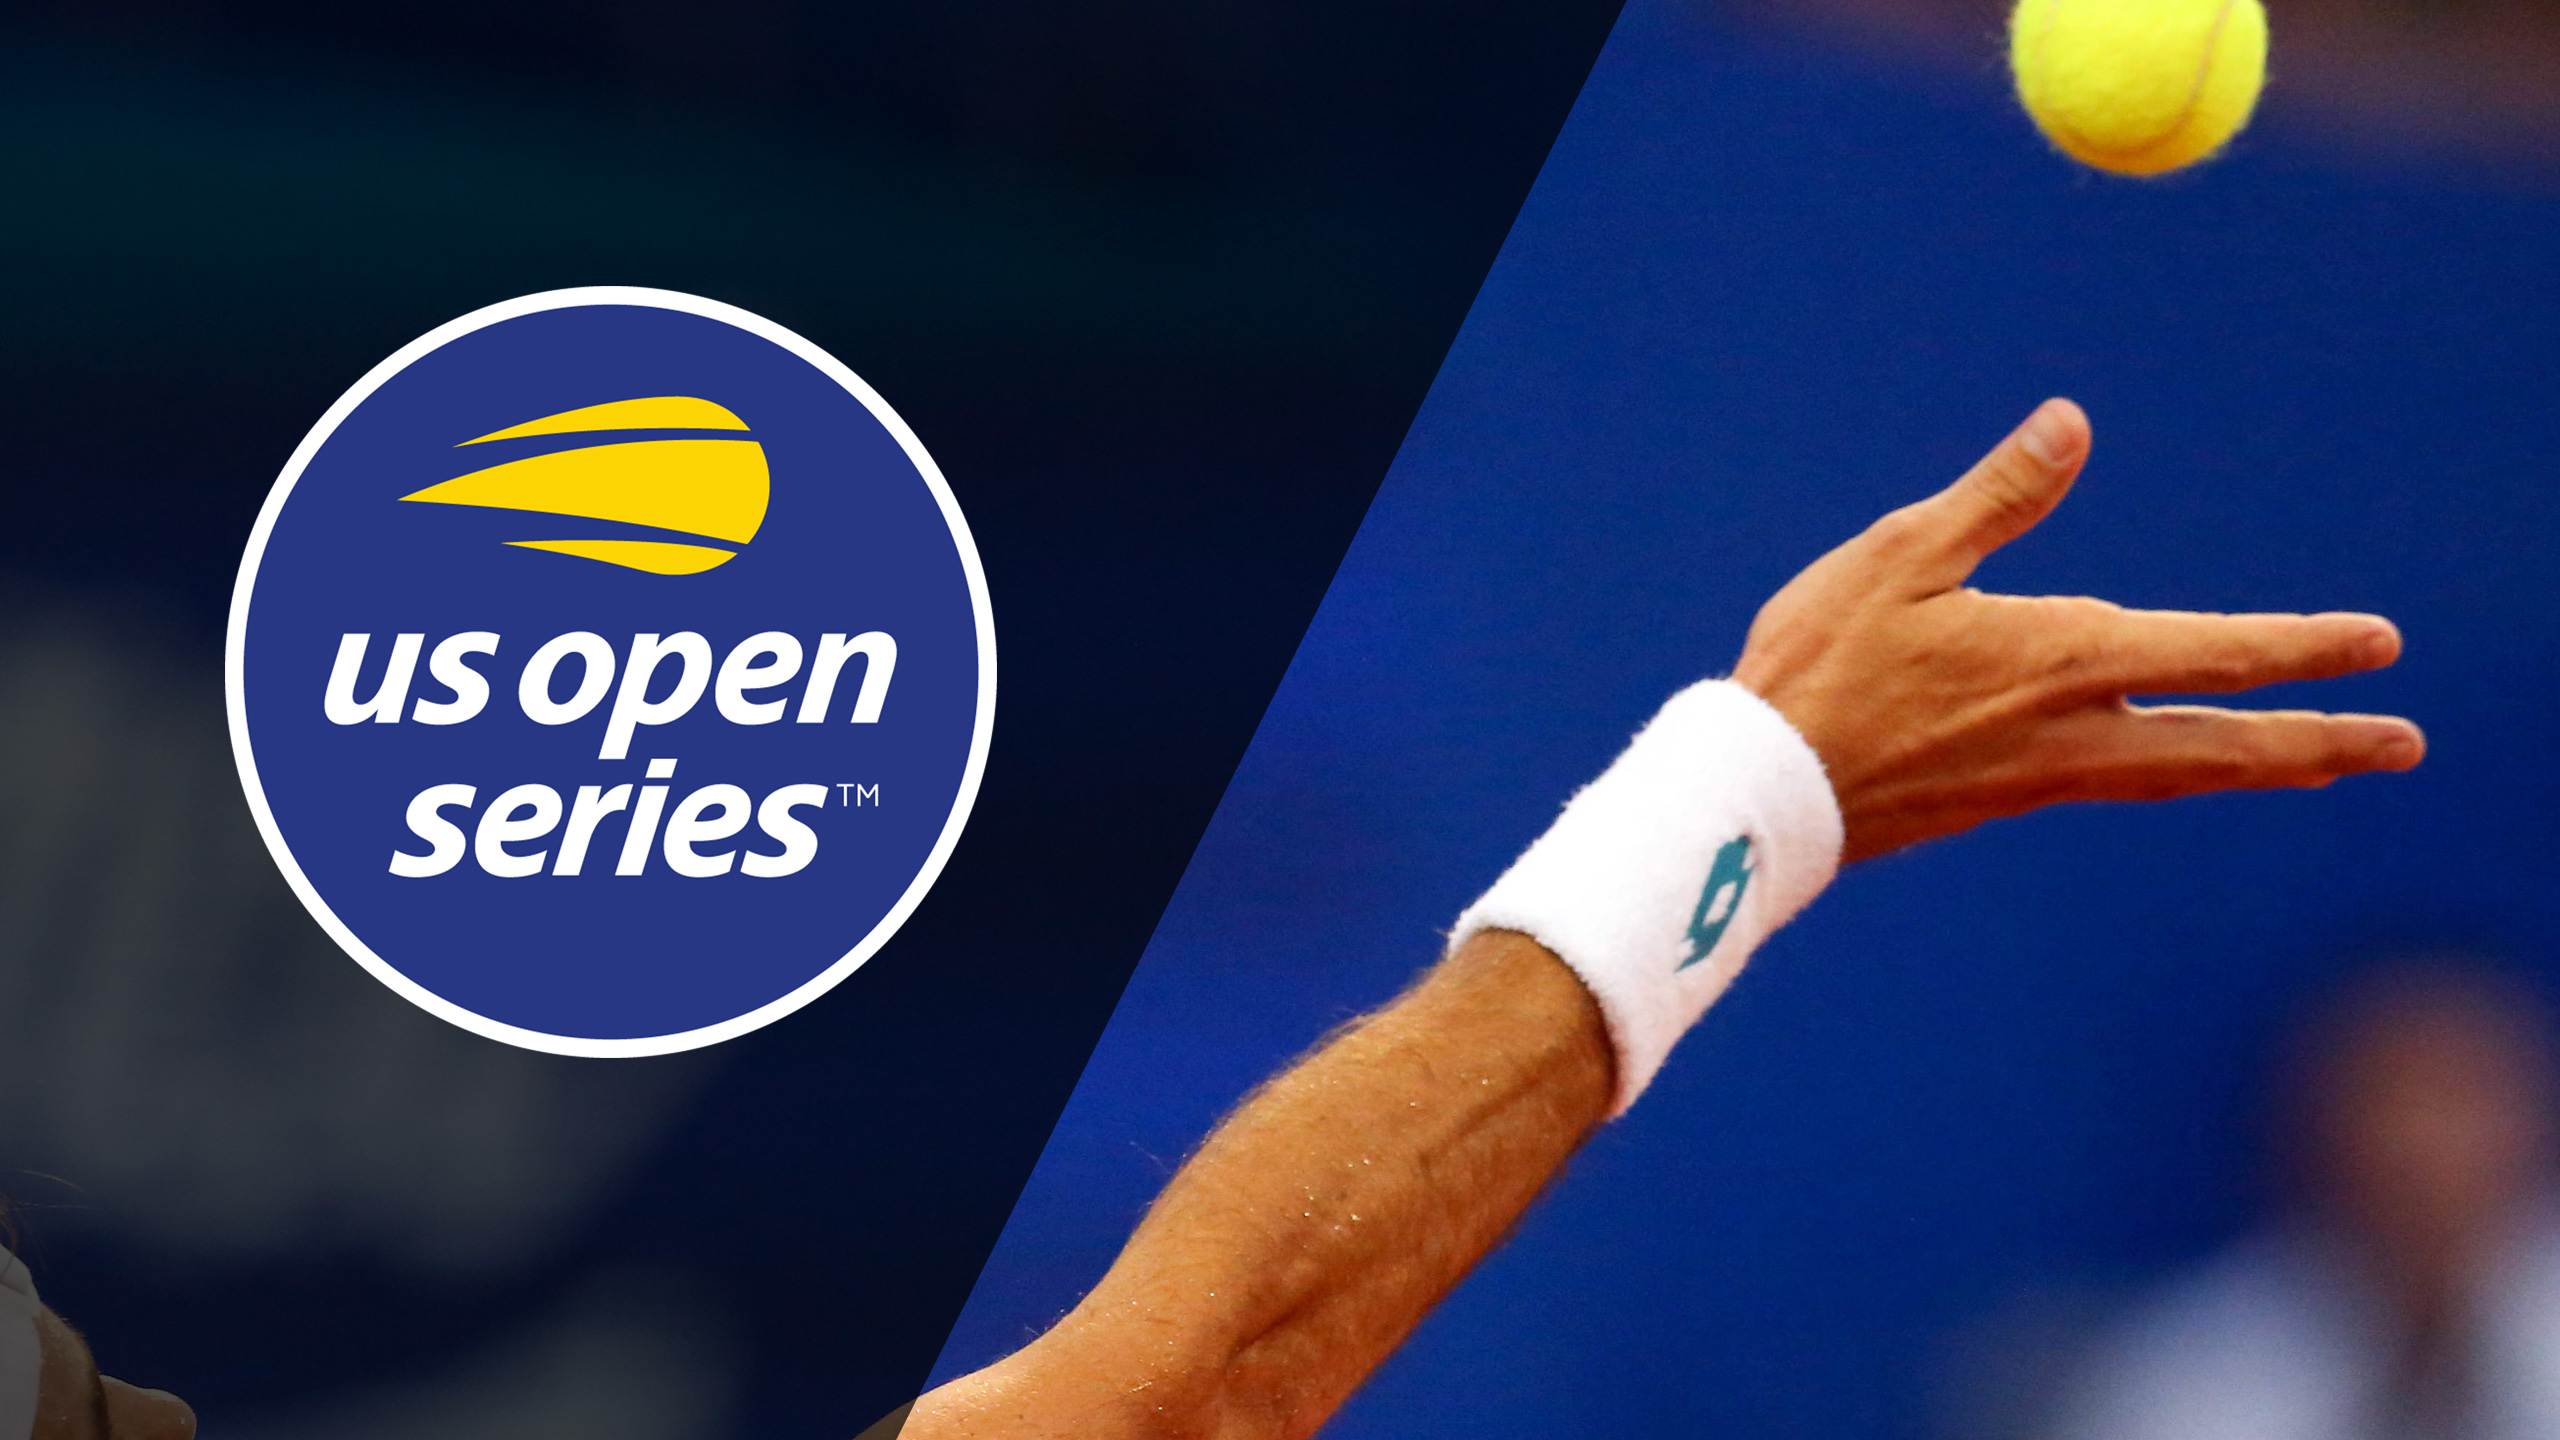 2018 US Open Series - BB&T Atlanta Open (Second Round)